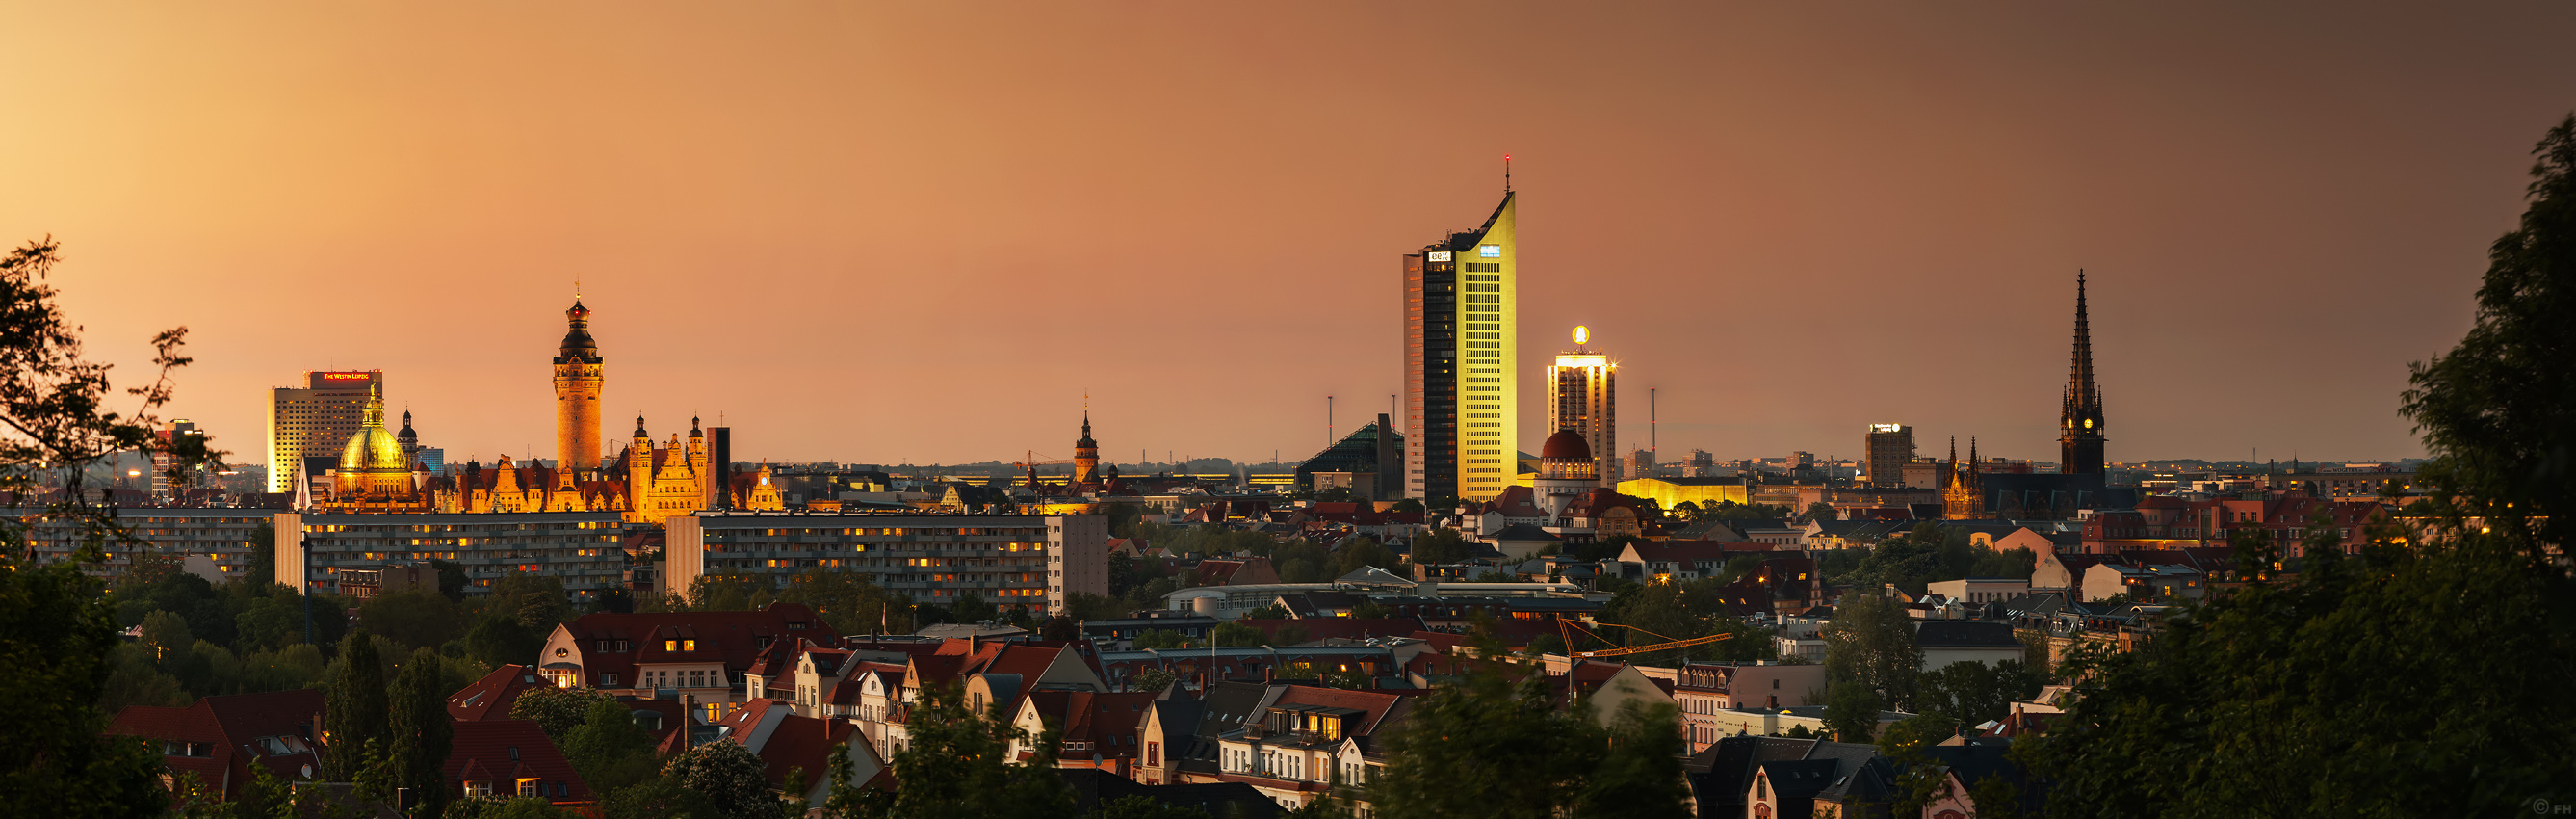 fhmedien.de   Leipzig Skyline